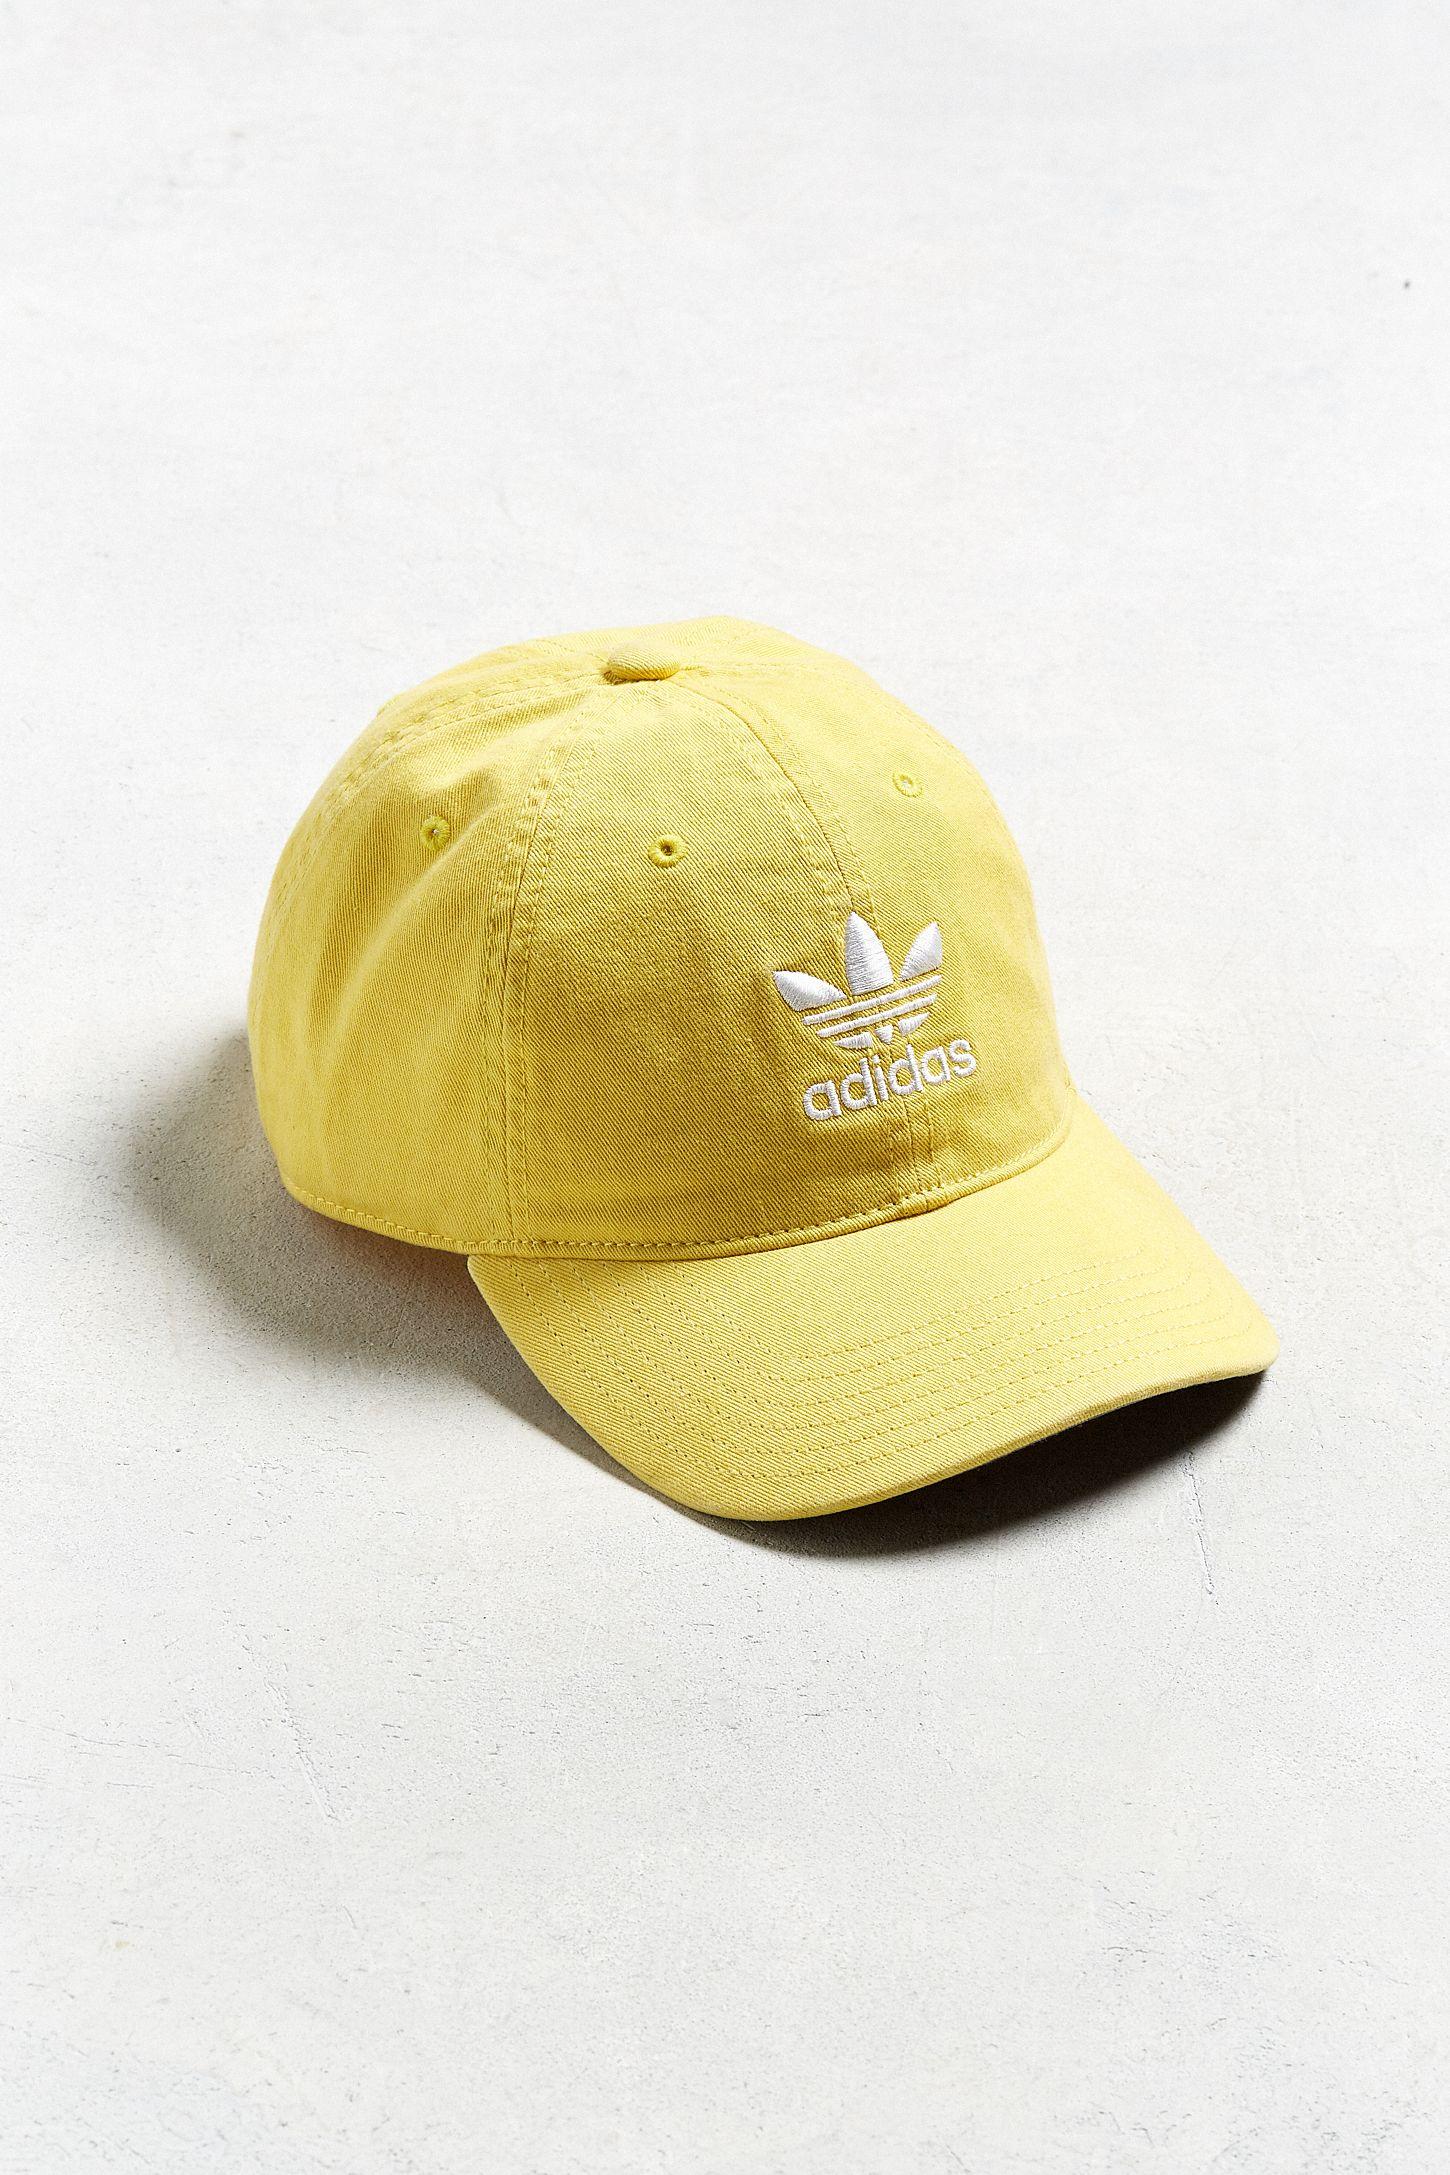 f6bccba0b690e adidas Originals Relaxed Yellow Baseball Hat